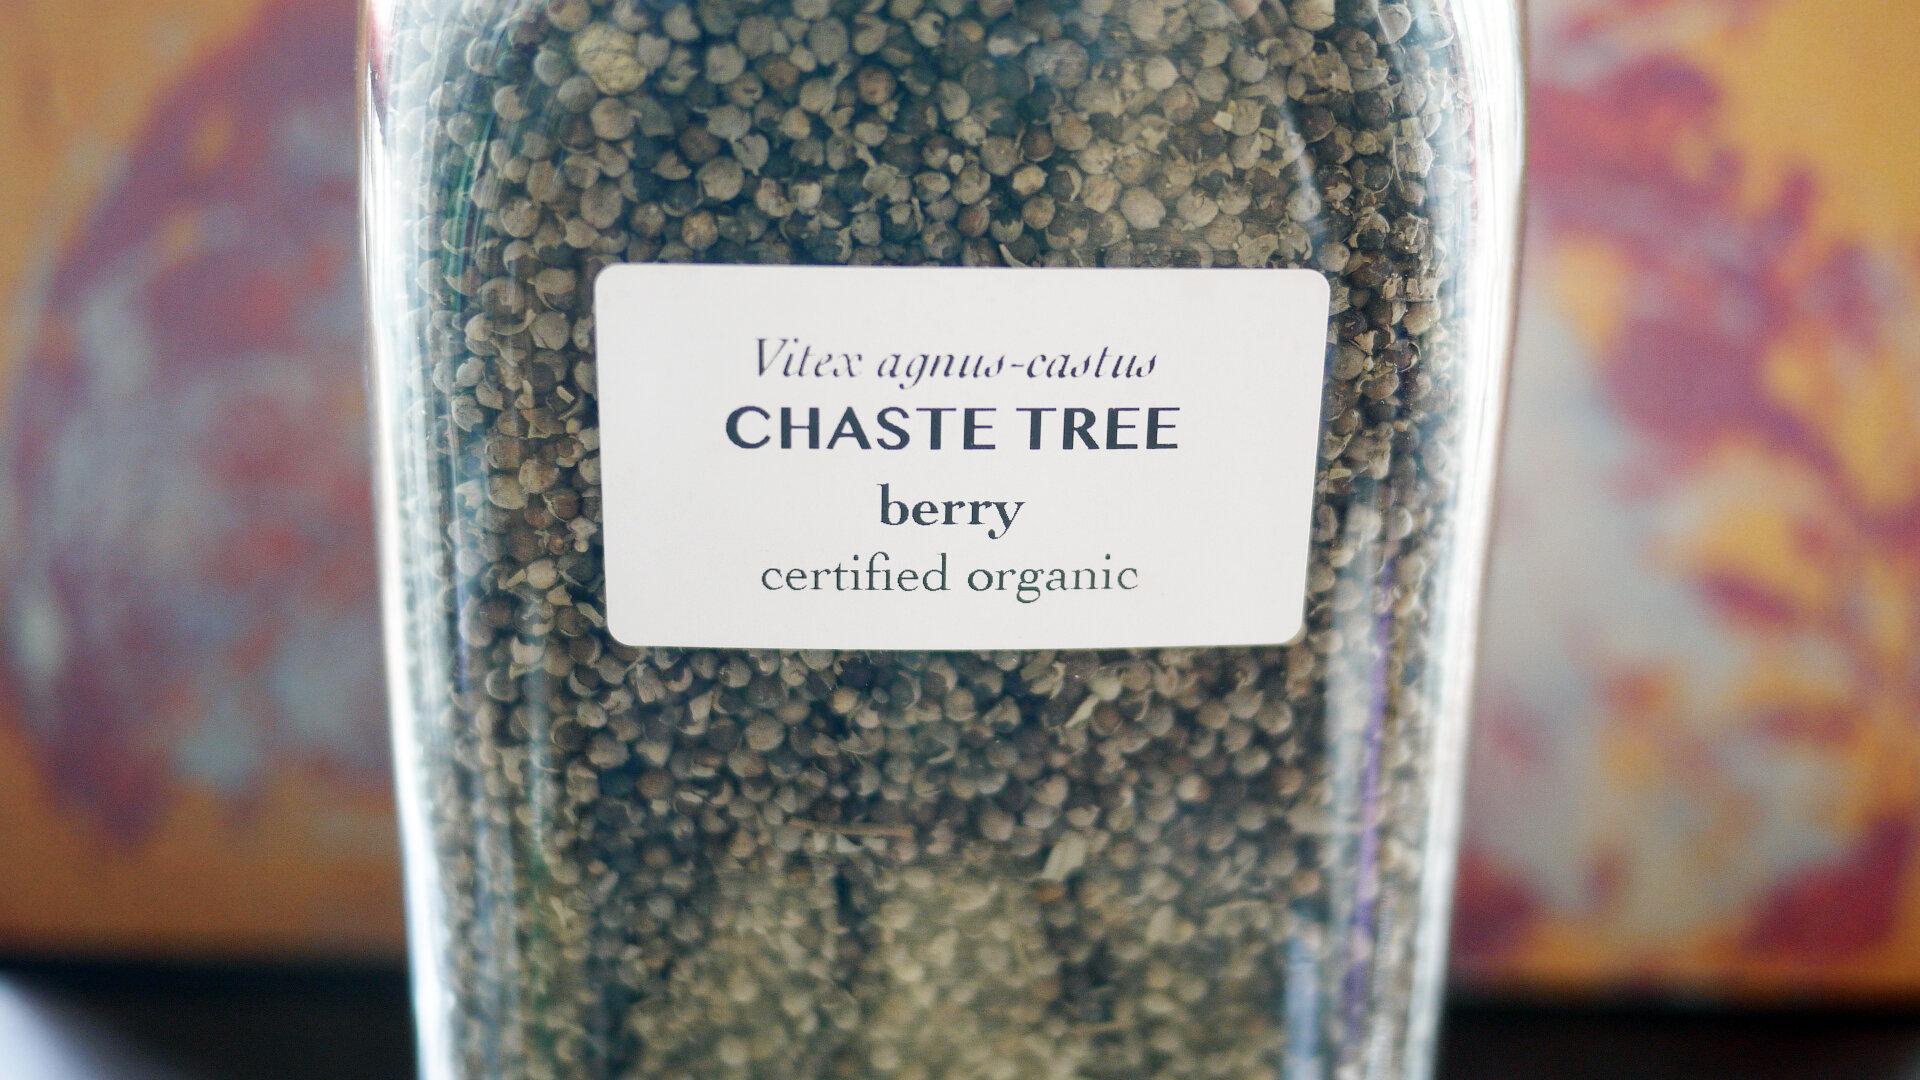 Chastetreeberry.jpg